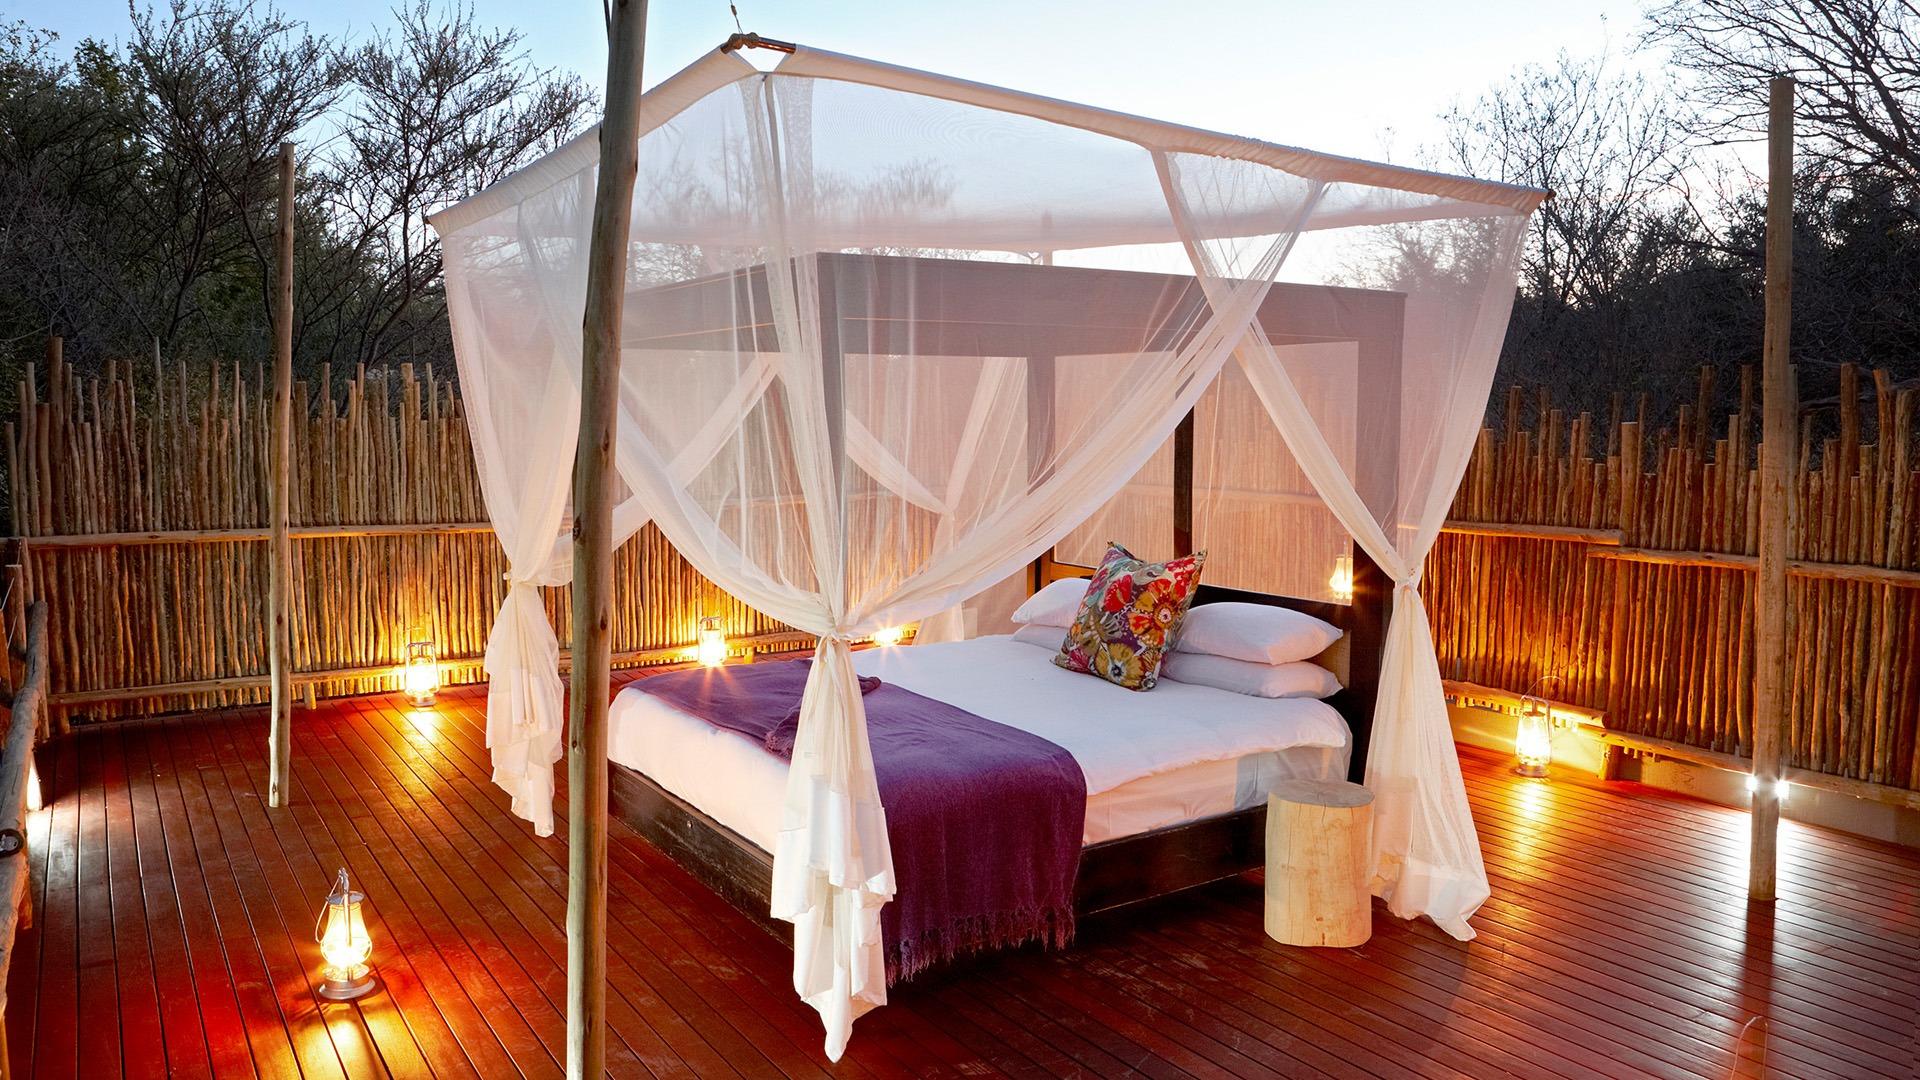 Image result for image jacqui lodge madikwe sleep under the stars bed